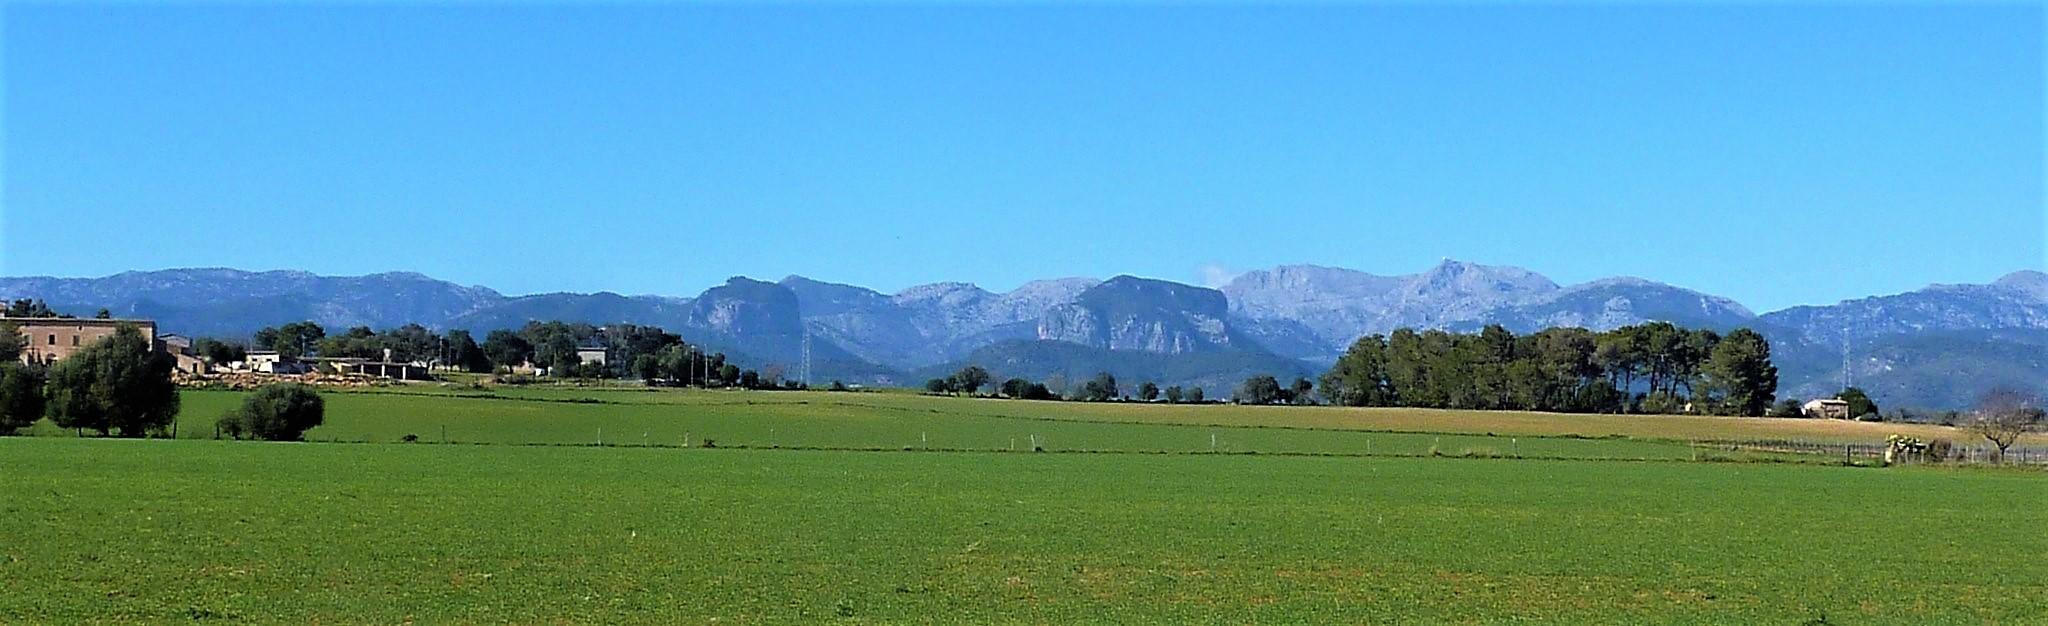 Tramuntana-Gebirge